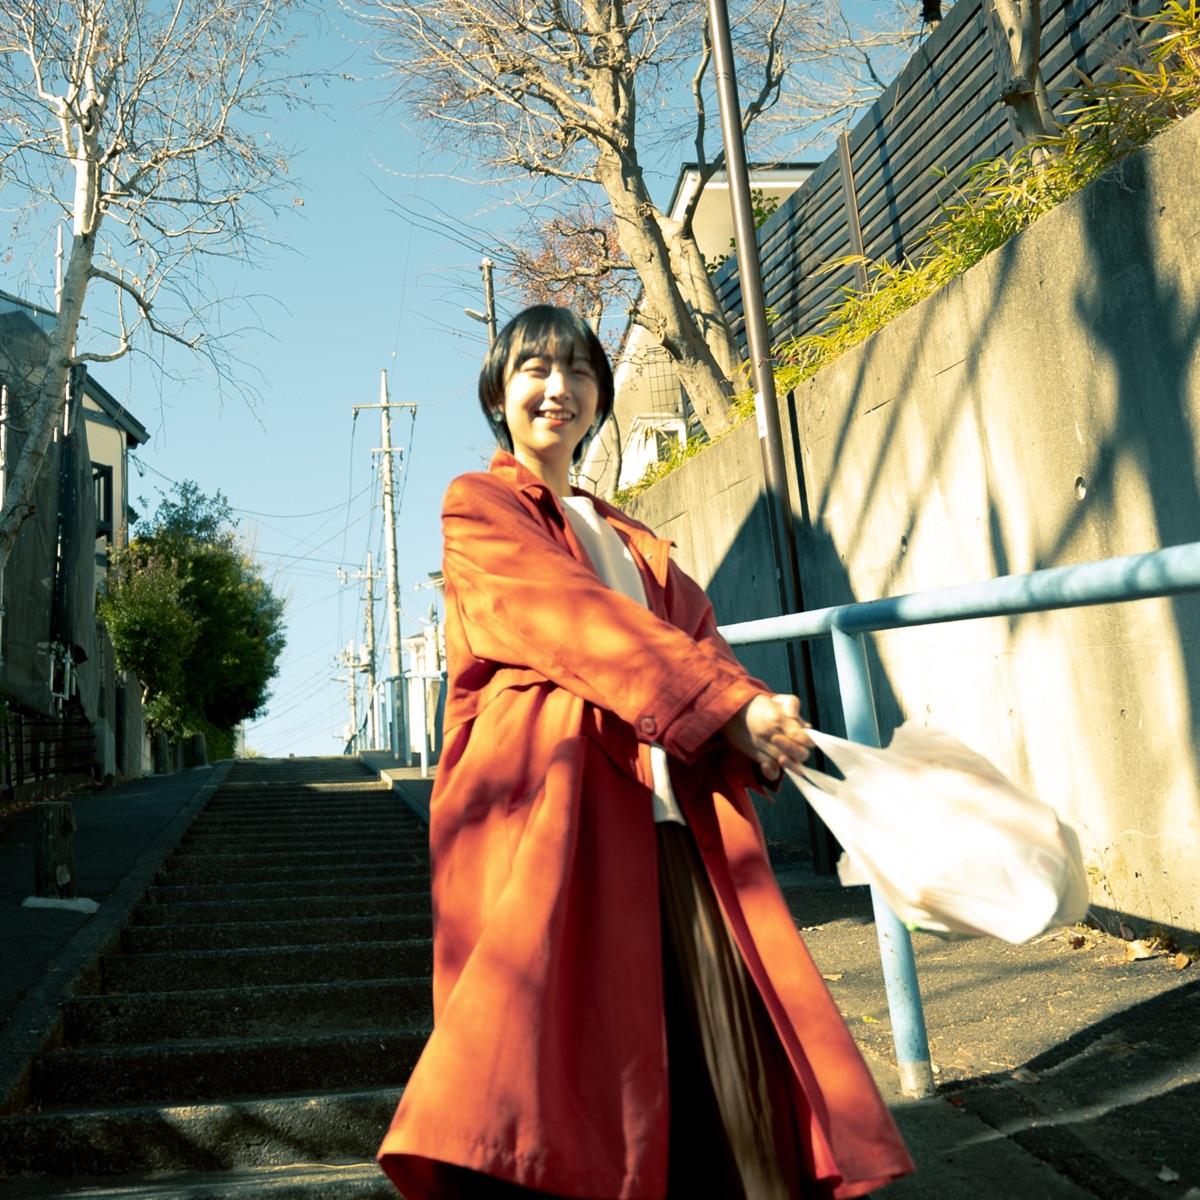 『Sori Sawada - 三年間 歌詞』収録の『三年間』ジャケット